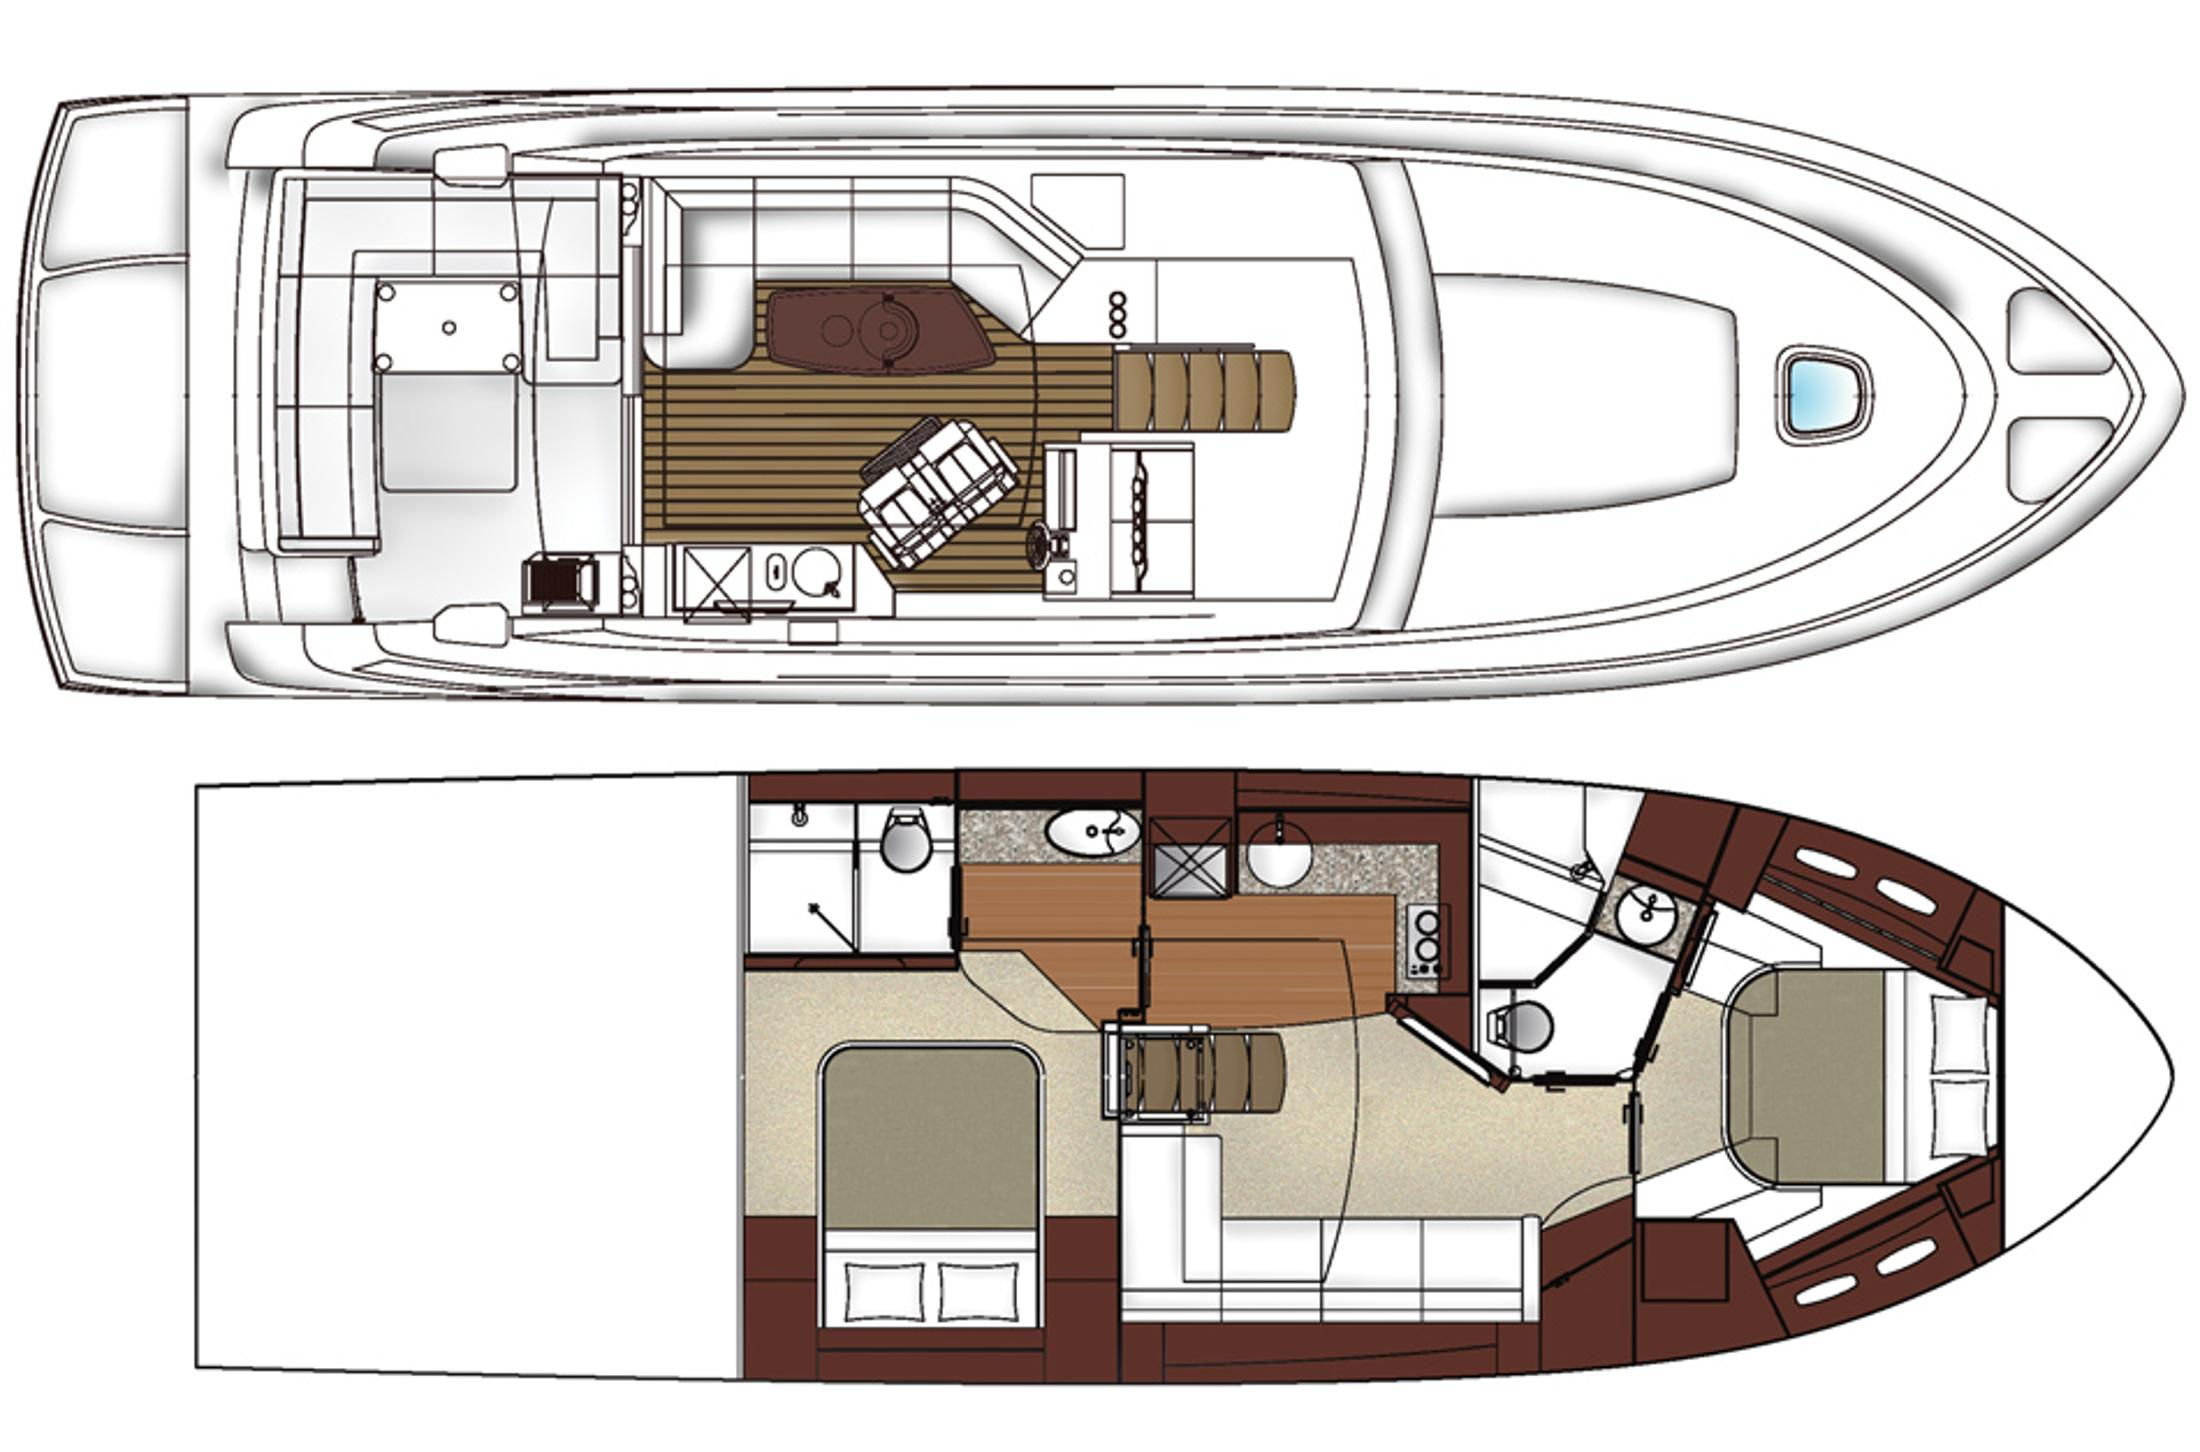 2015 Sea Ray 510 Sundancer